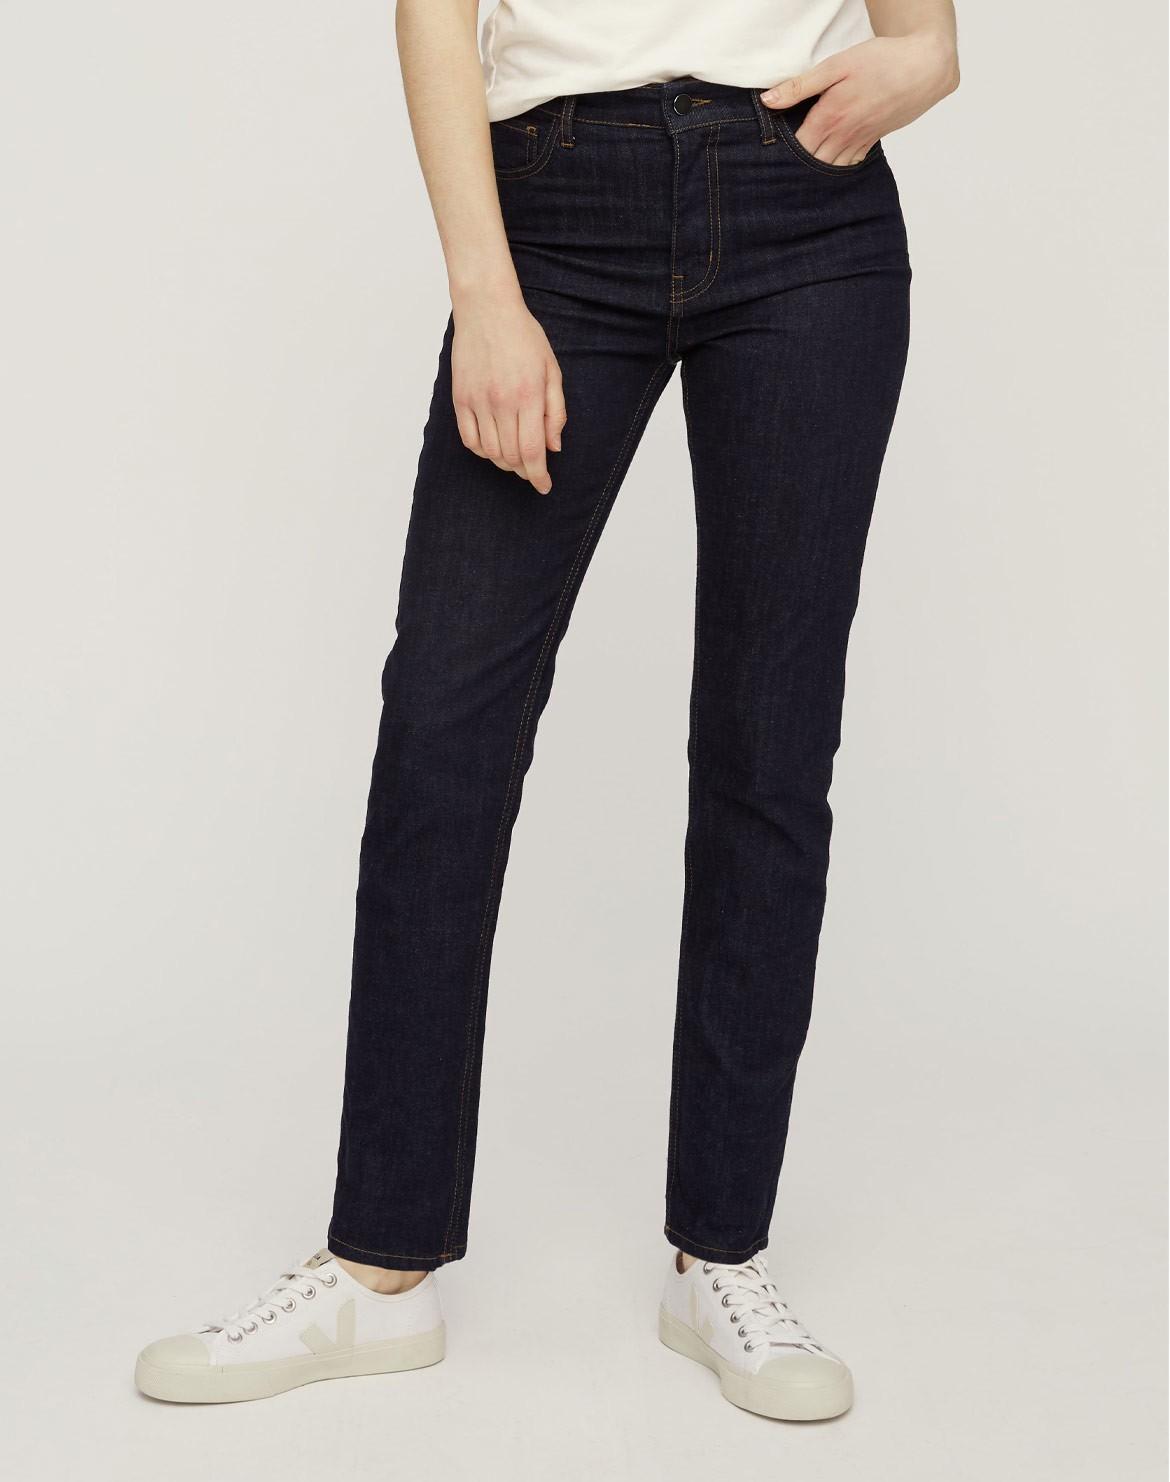 Heather Slim Fit Jeans